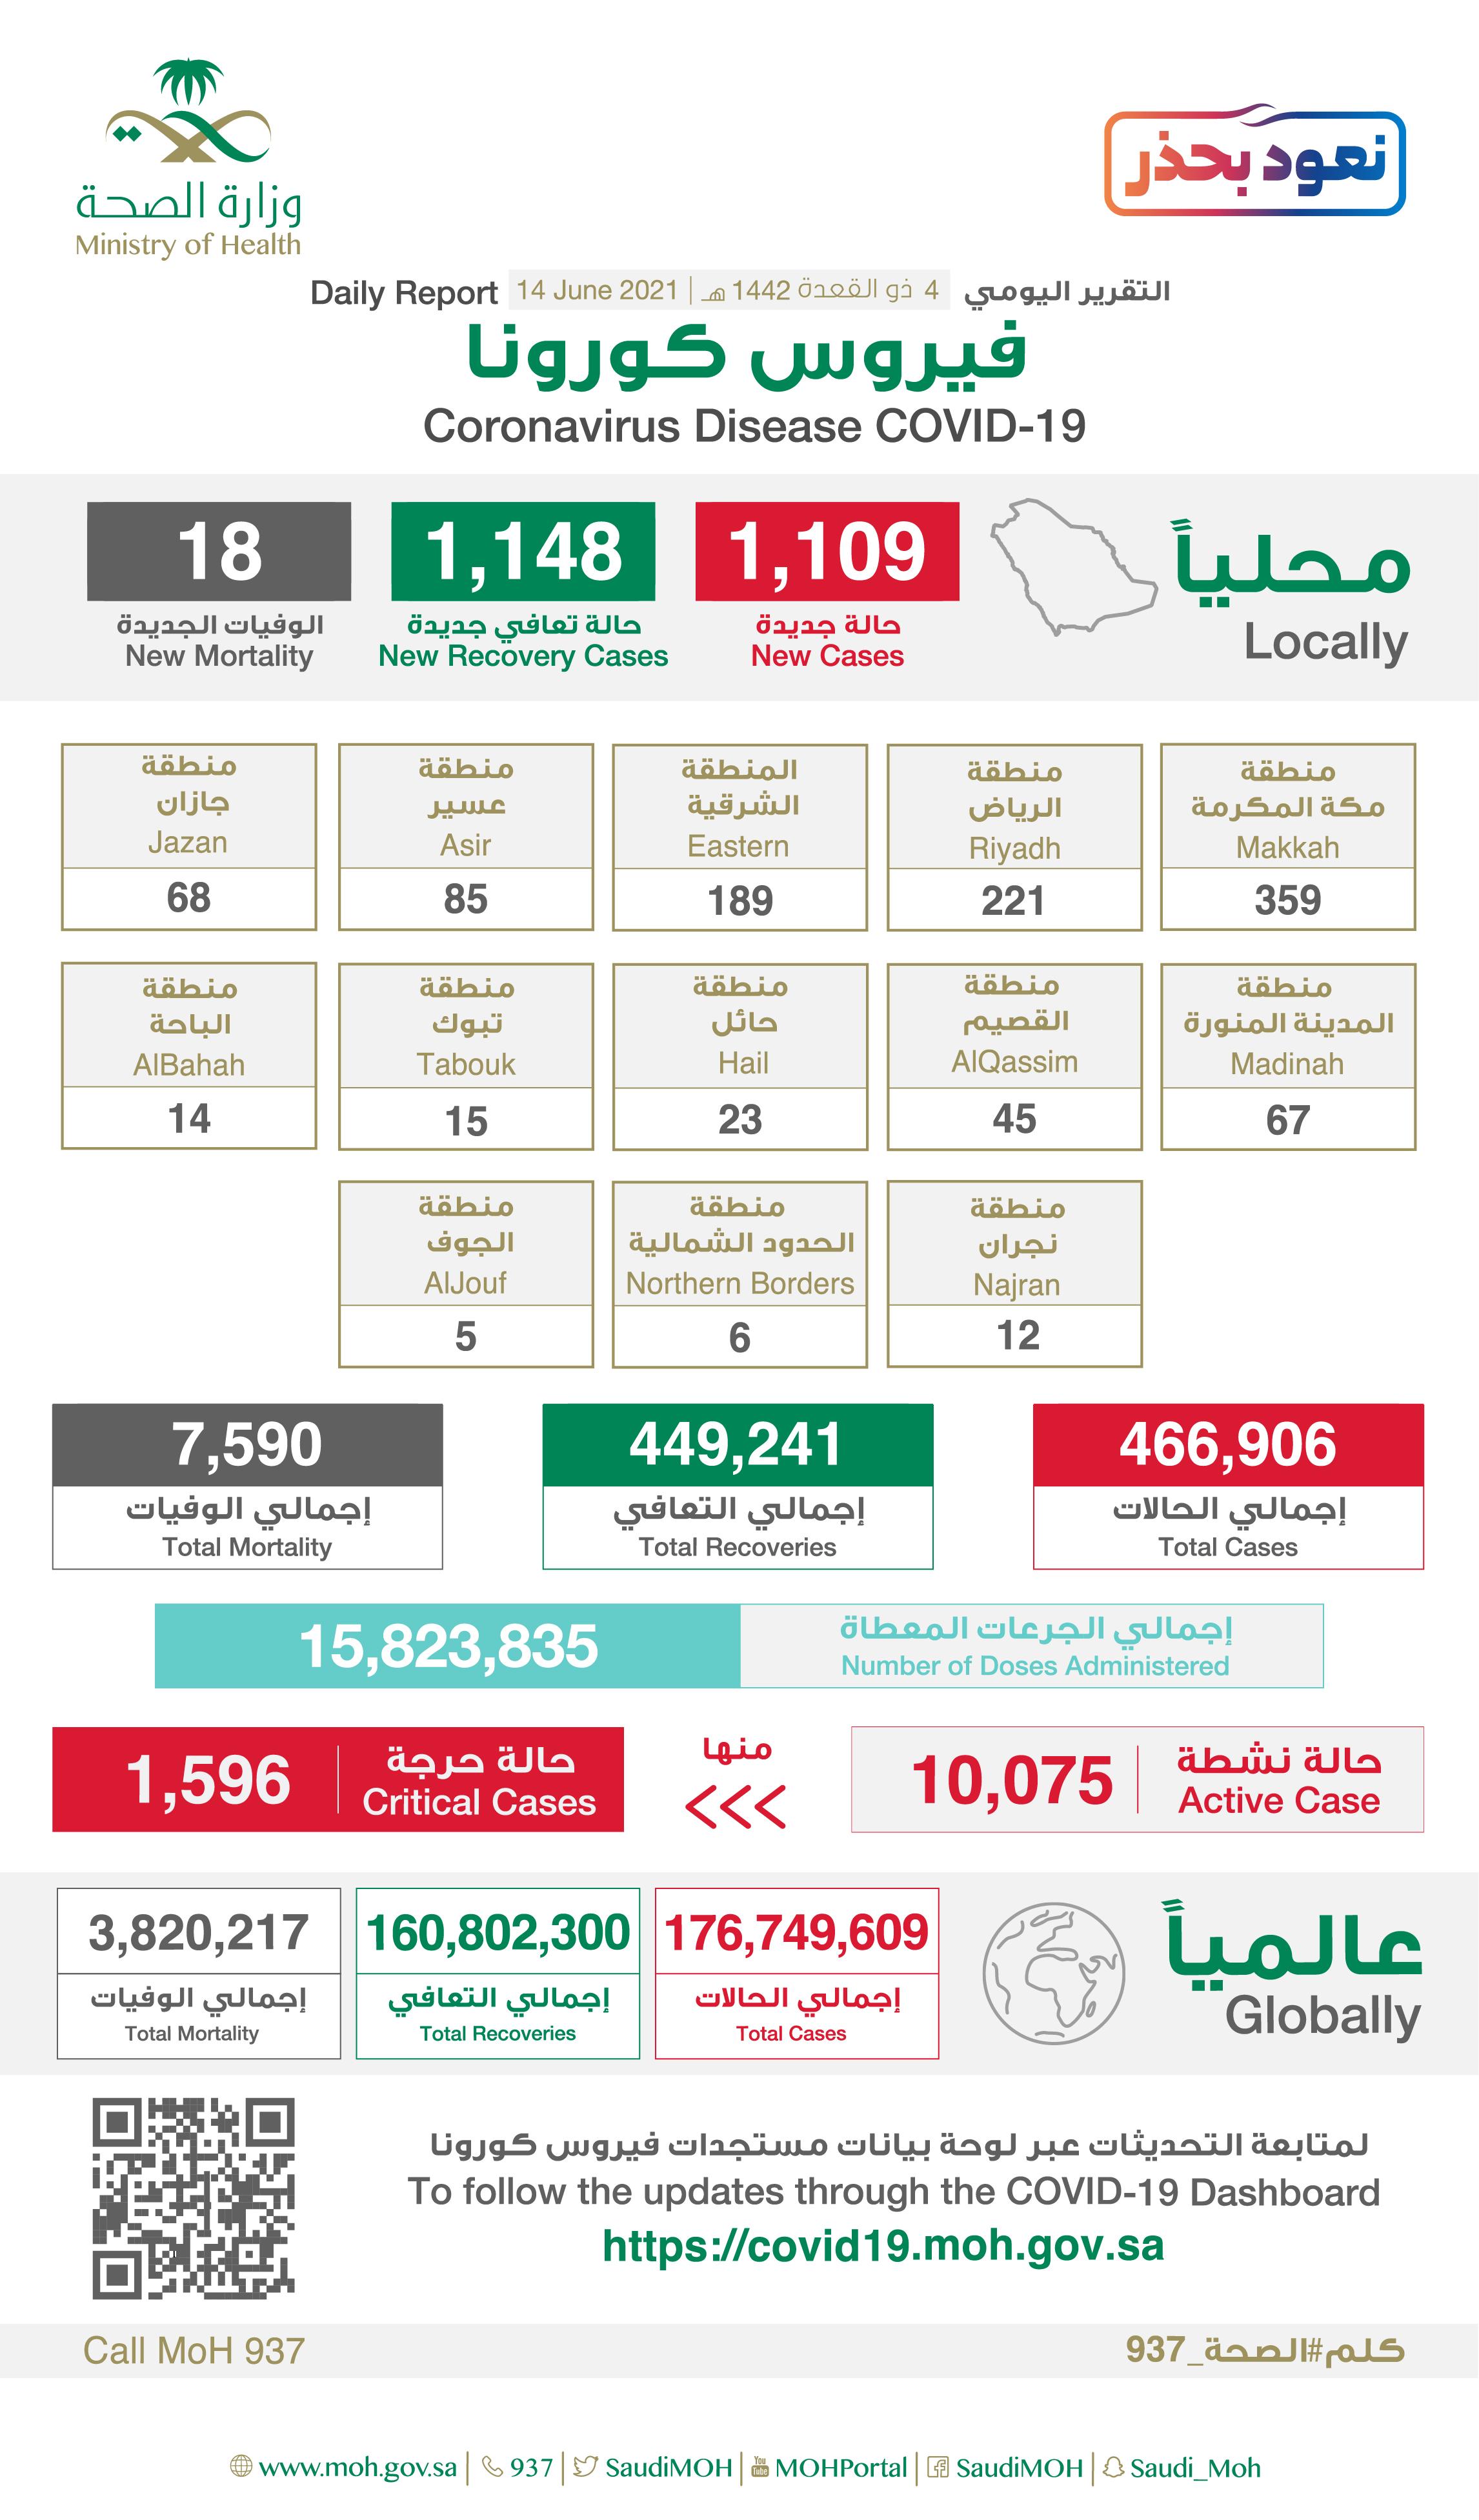 Saudi Arabia Coronavirus : Total Cases :466,906 , New Cases : 1,109 , Cured : 449,241 , Deaths: 7,590, Active Cases : 10,075